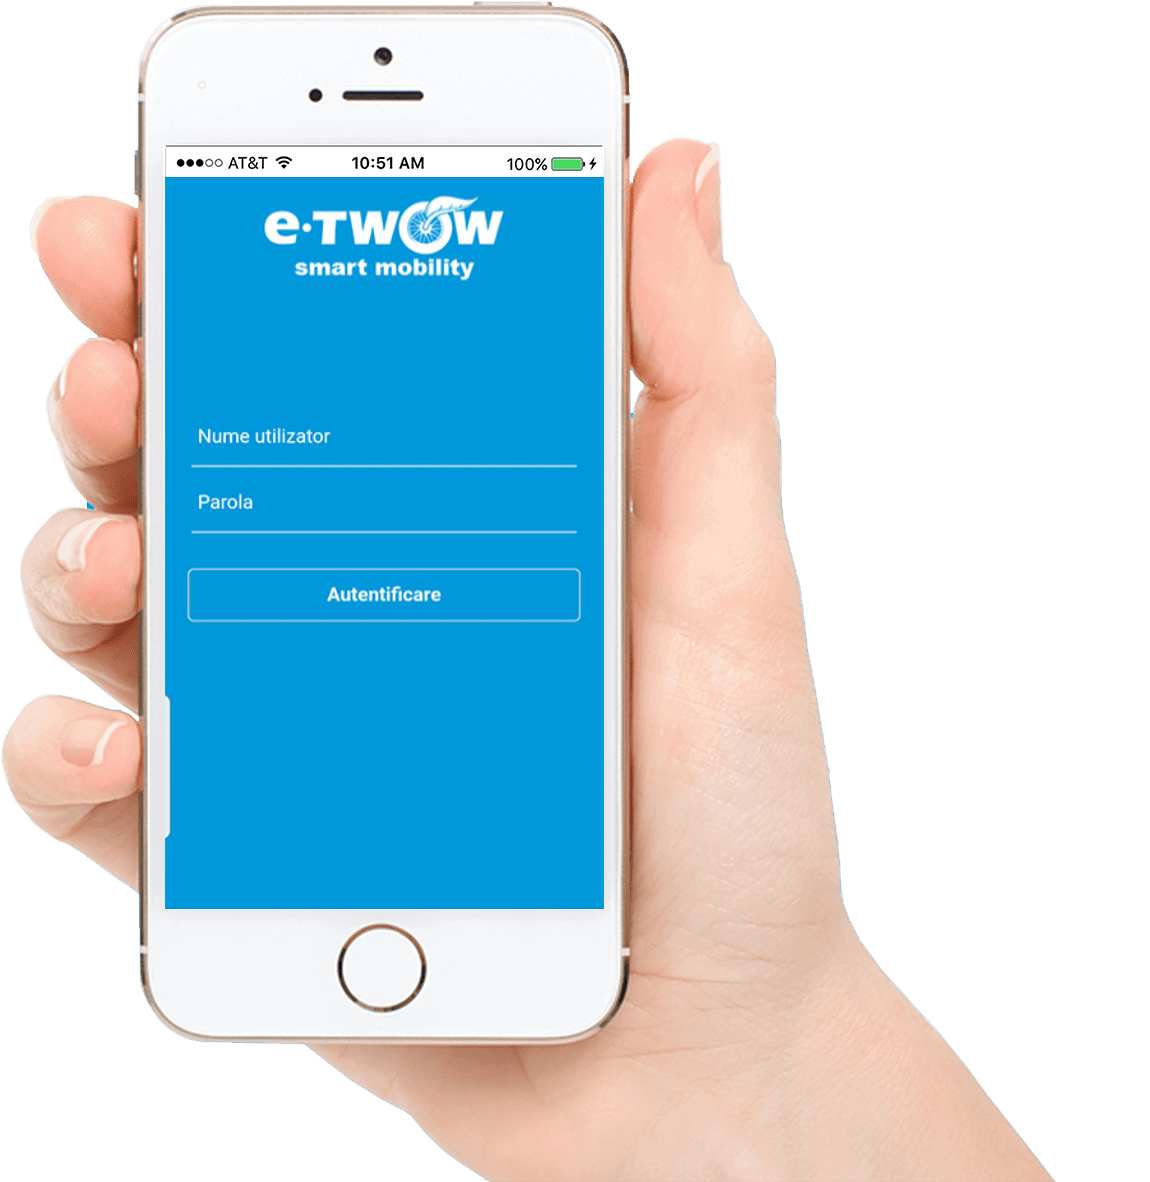 etwow-smart-mobility-app-min